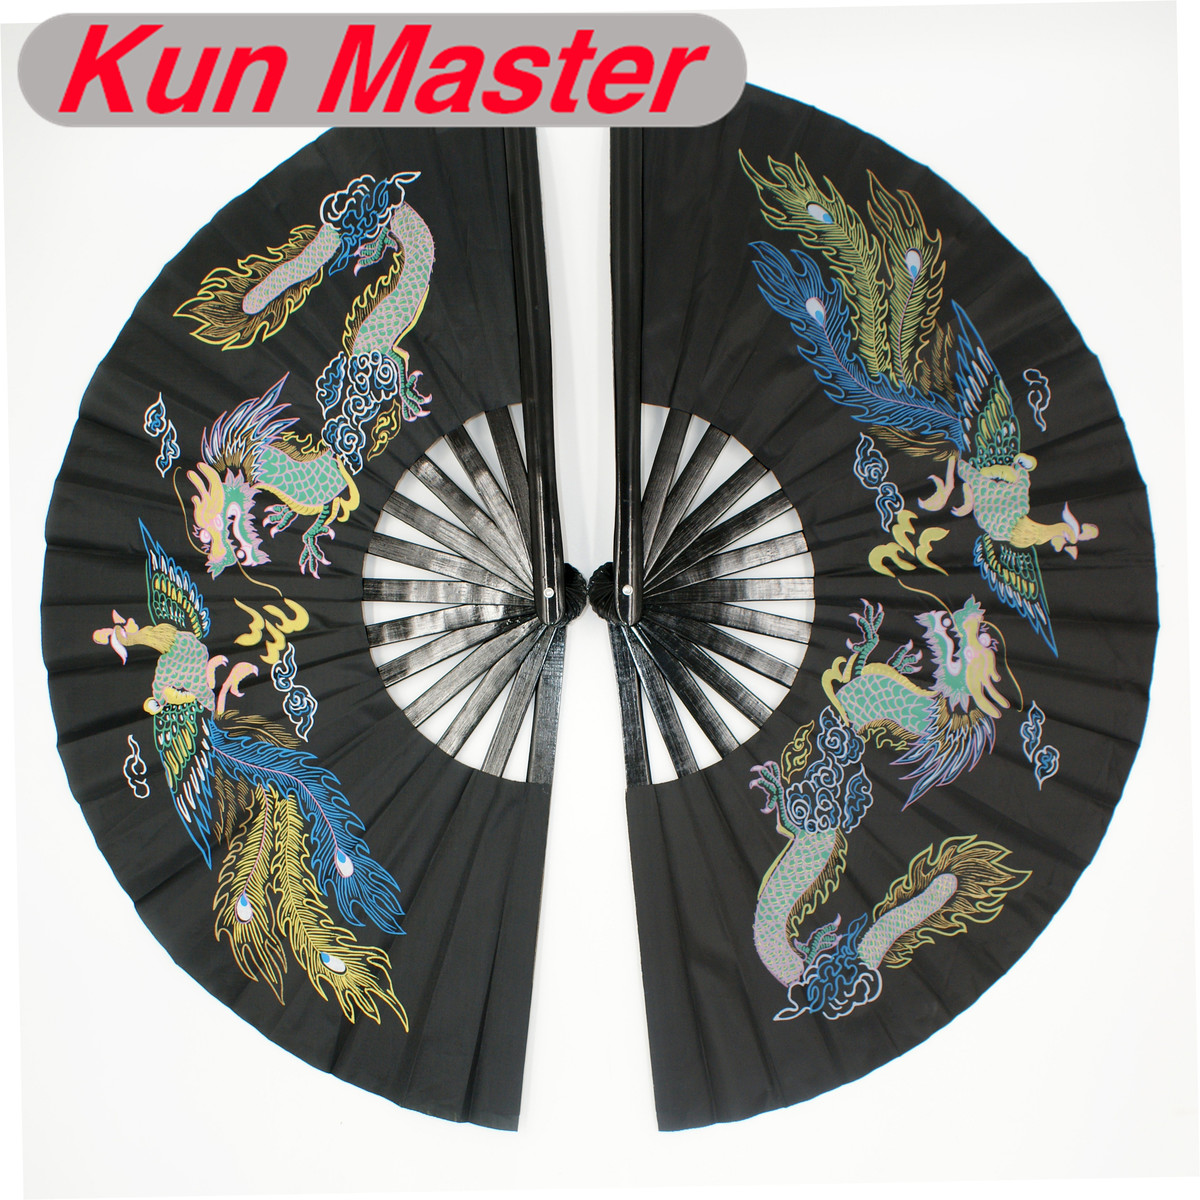 Bamboo Double High-grade  Tai Chi Performance Fan  Martial Arts Fan Kung Fu Fans Black Cover China Dragon And Phoenix Pattern